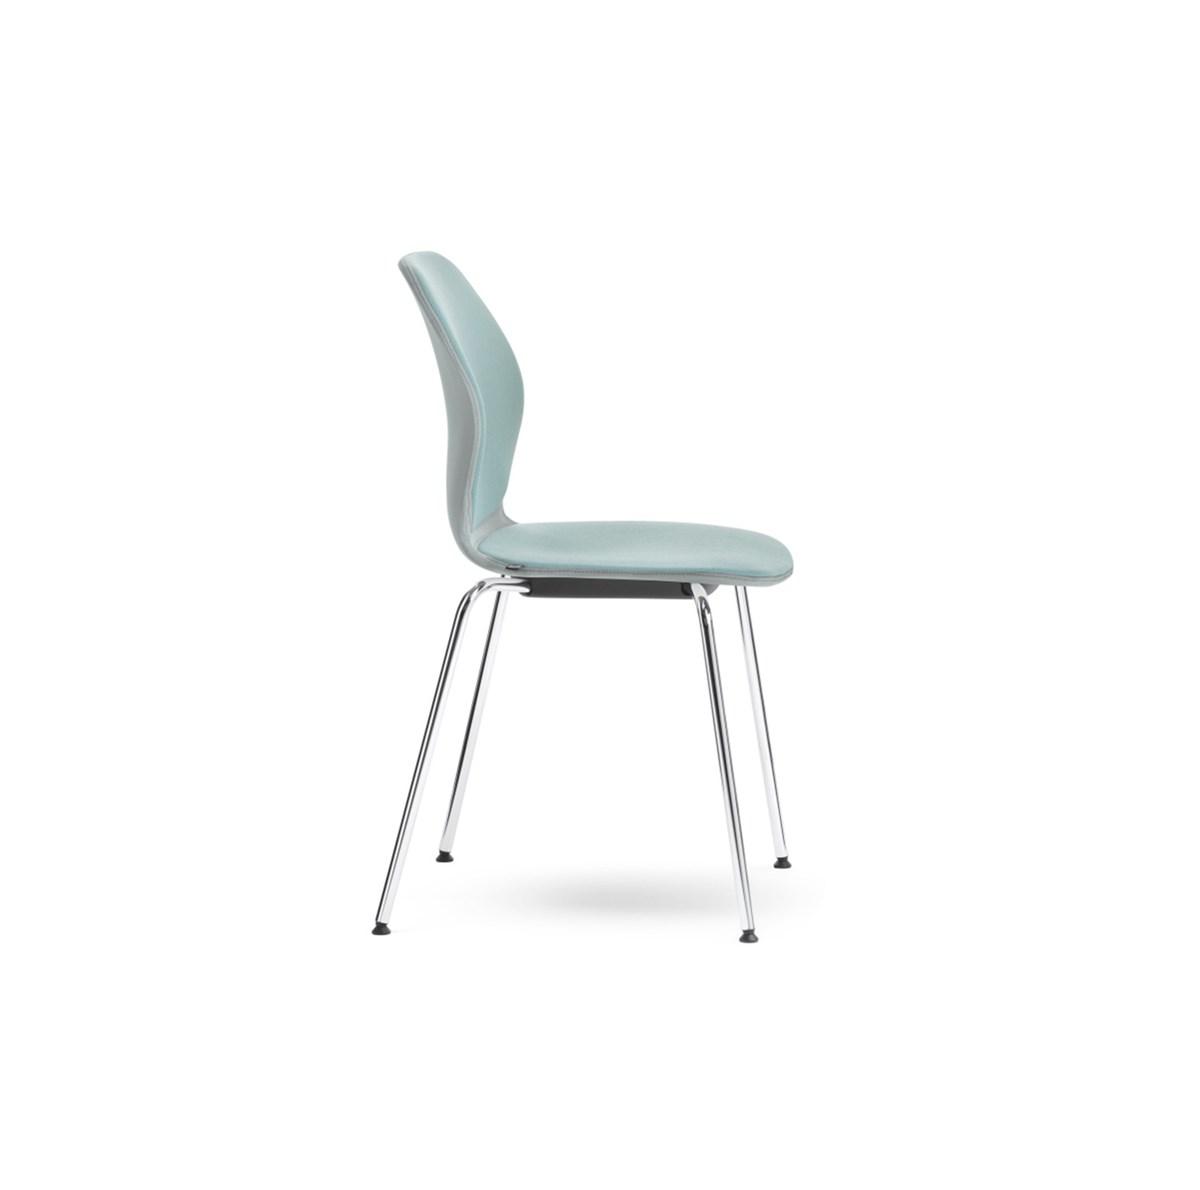 Sedus-Se:spot-Chair-Matisse-1